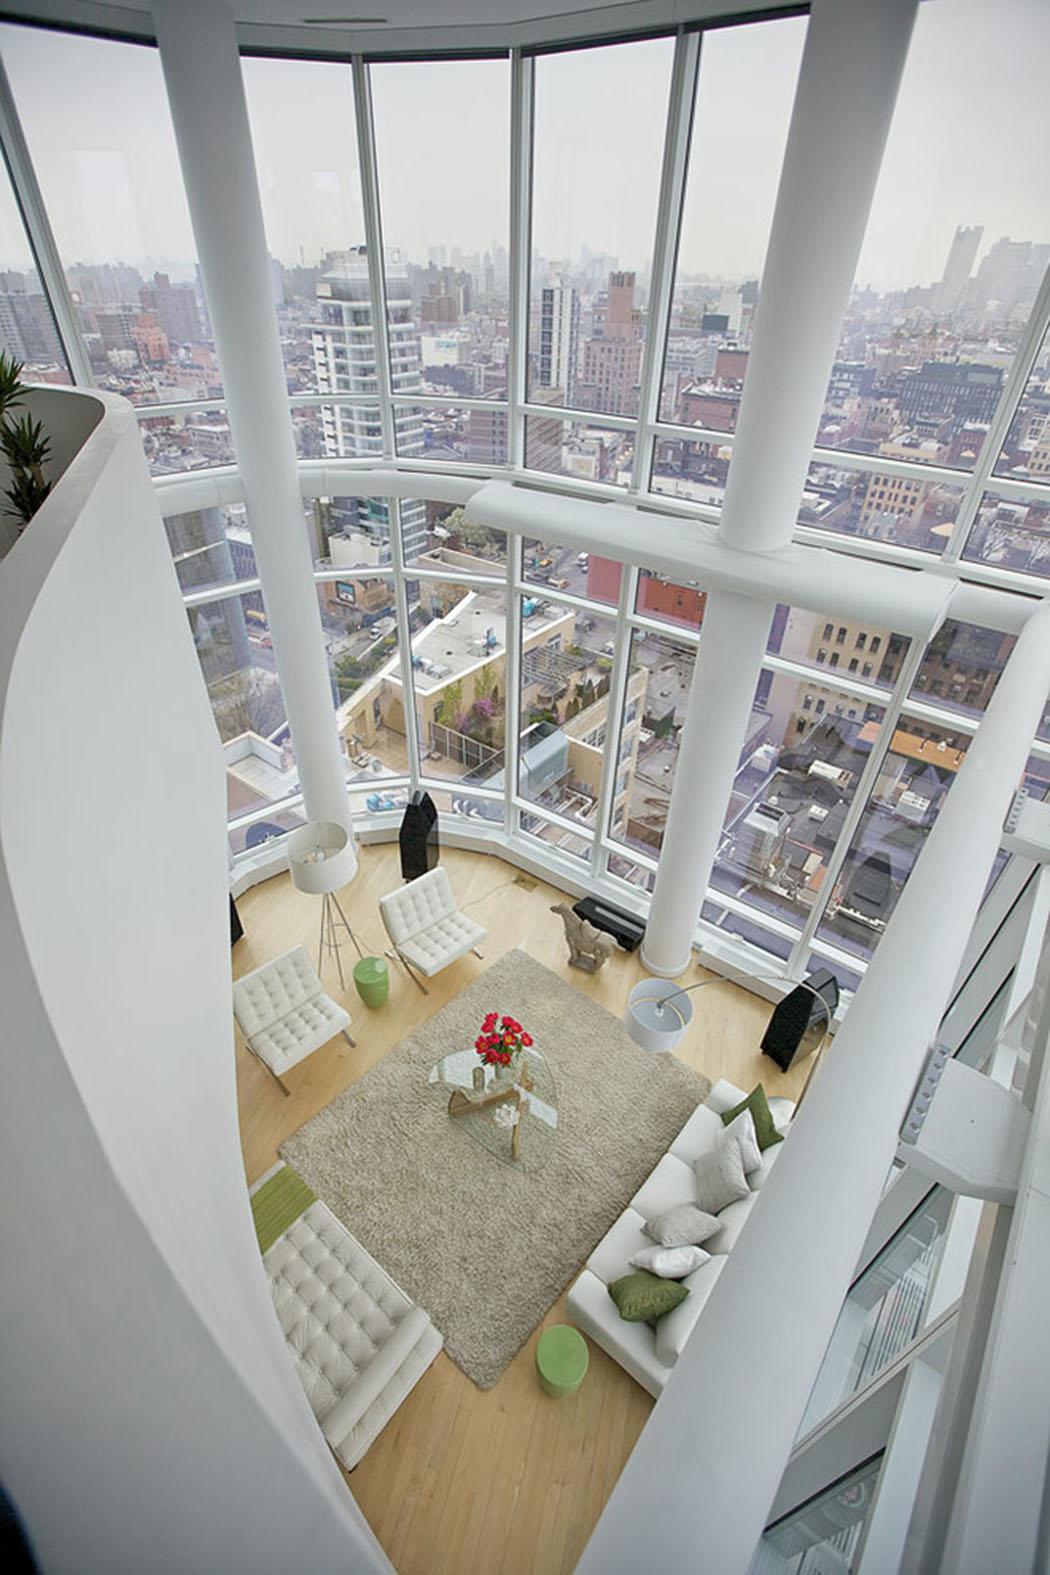 Bel appartement de standing avec vue imprenable sur manhattan vivons maison - Appartement de luxe new york ...